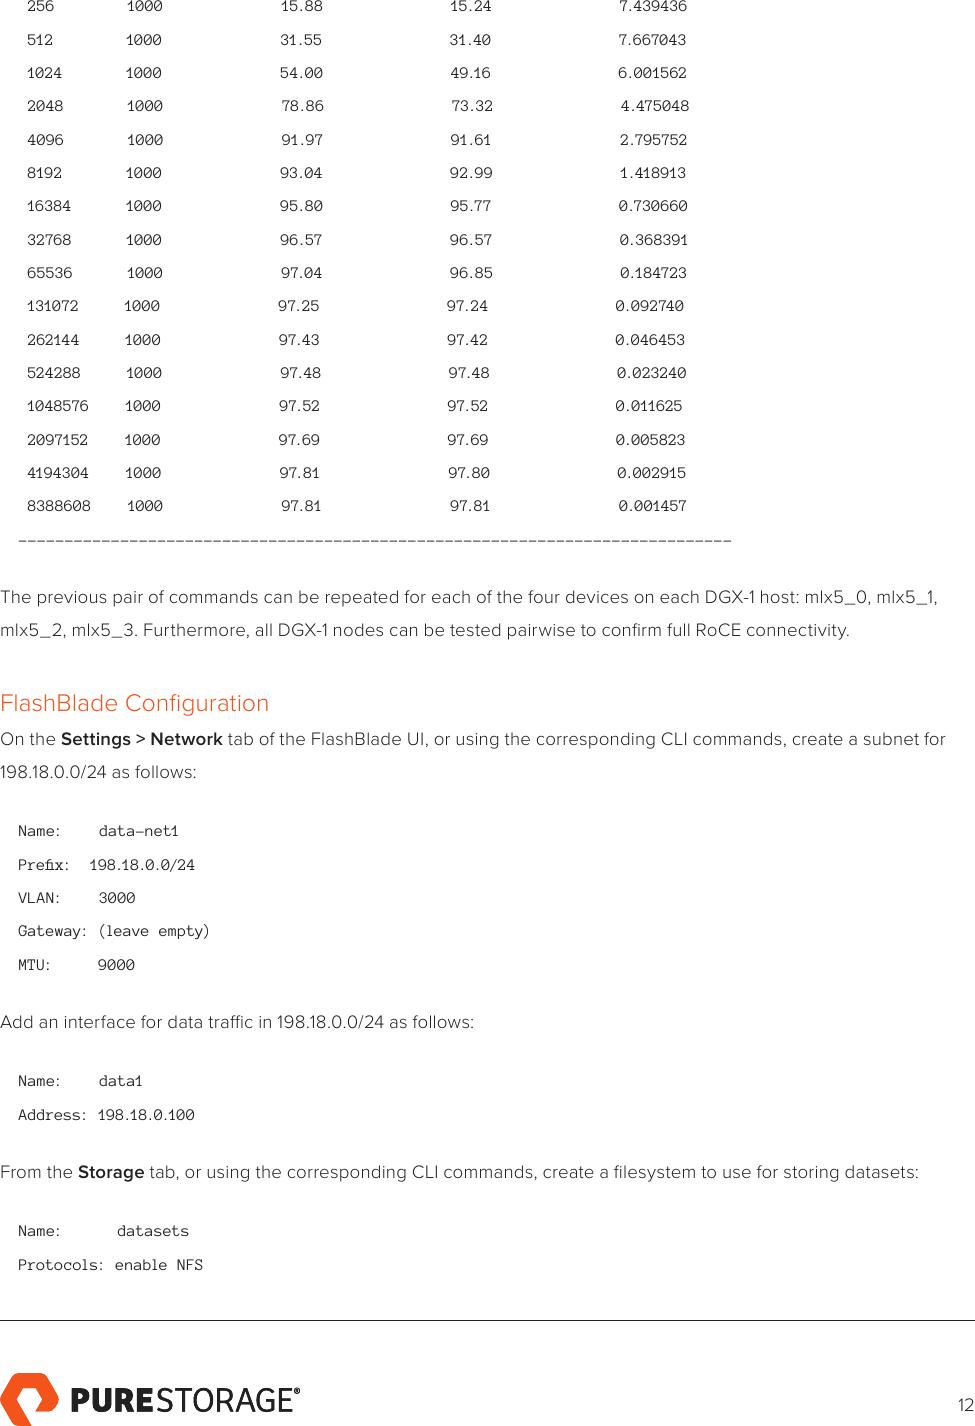 AIRI™ Configuration Guide With Cisco Nexus 9300 Switch AIRI Config